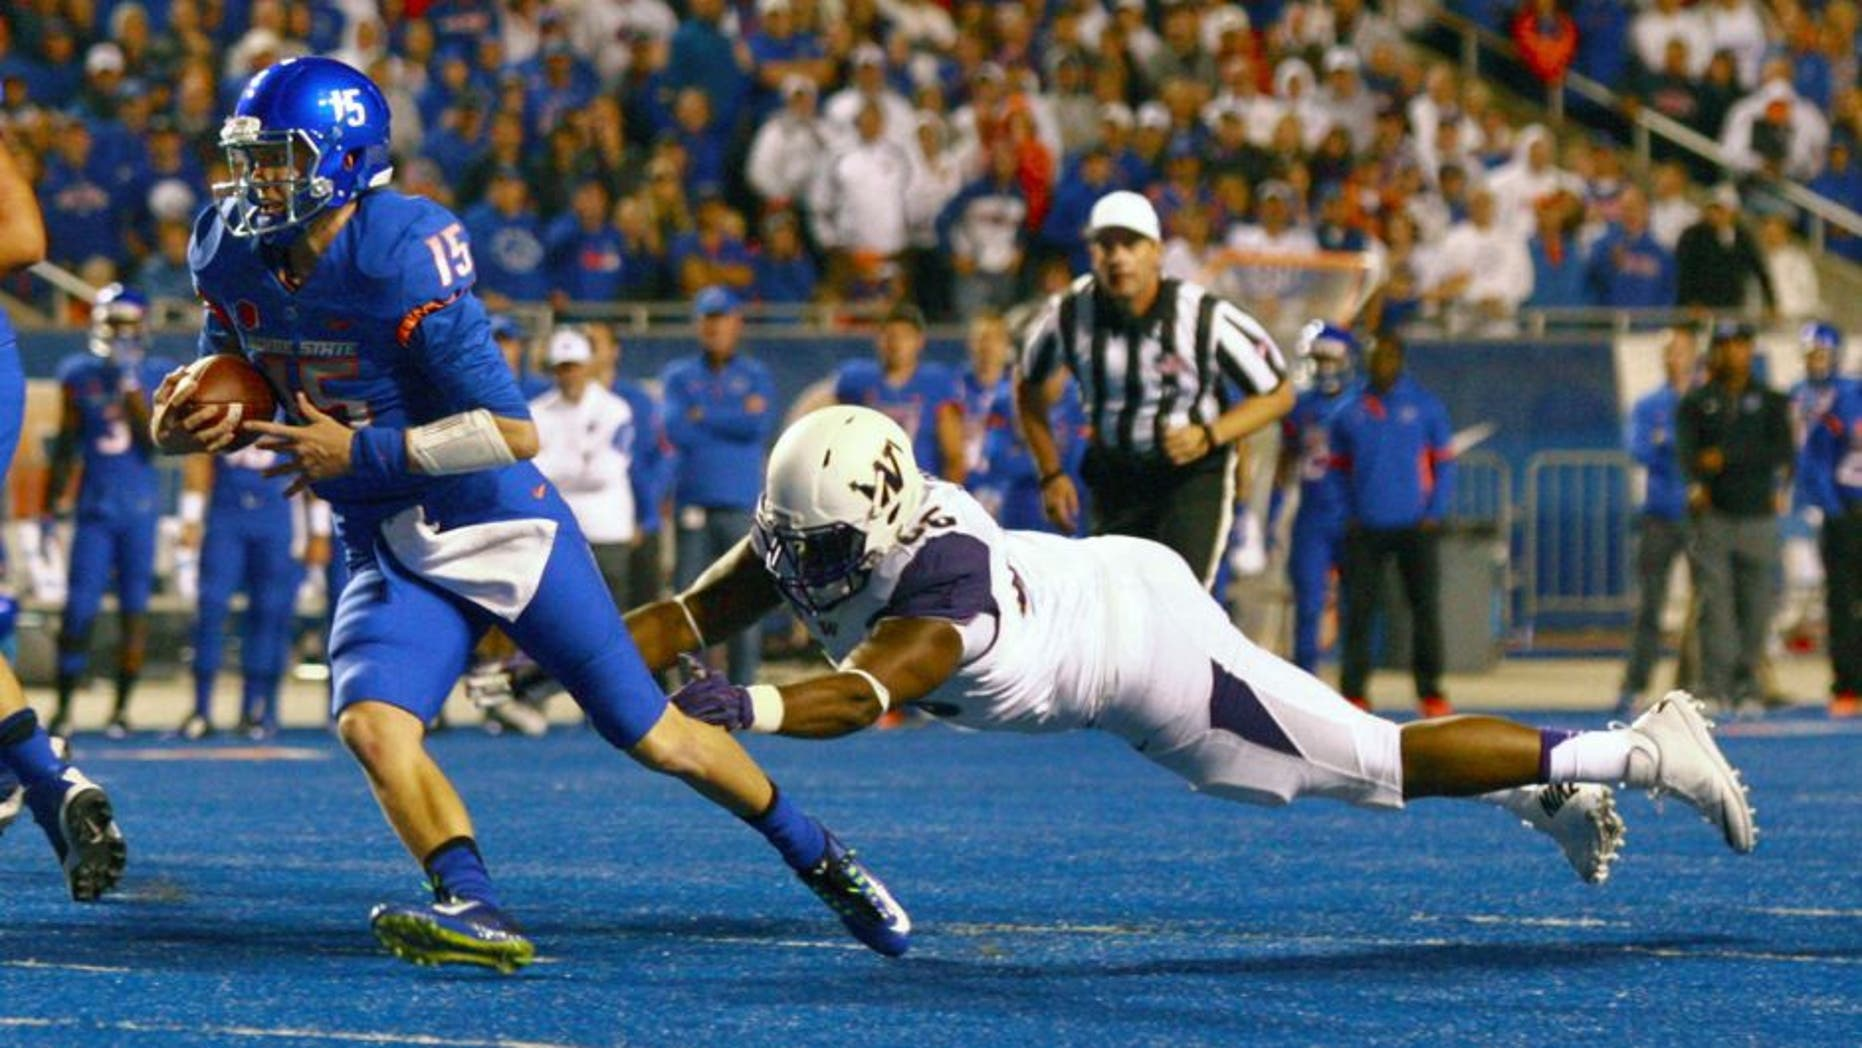 Sep 4, 2015; Boise, ID, USA; Boise State Broncos quarterback Ryan Finley (15) runs away from Washington Huskies defensive lineman Damion Turpin (66) during the first half at Albertsons Stadium. Mandatory Credit: Brian Losness-USA TODAY Sports